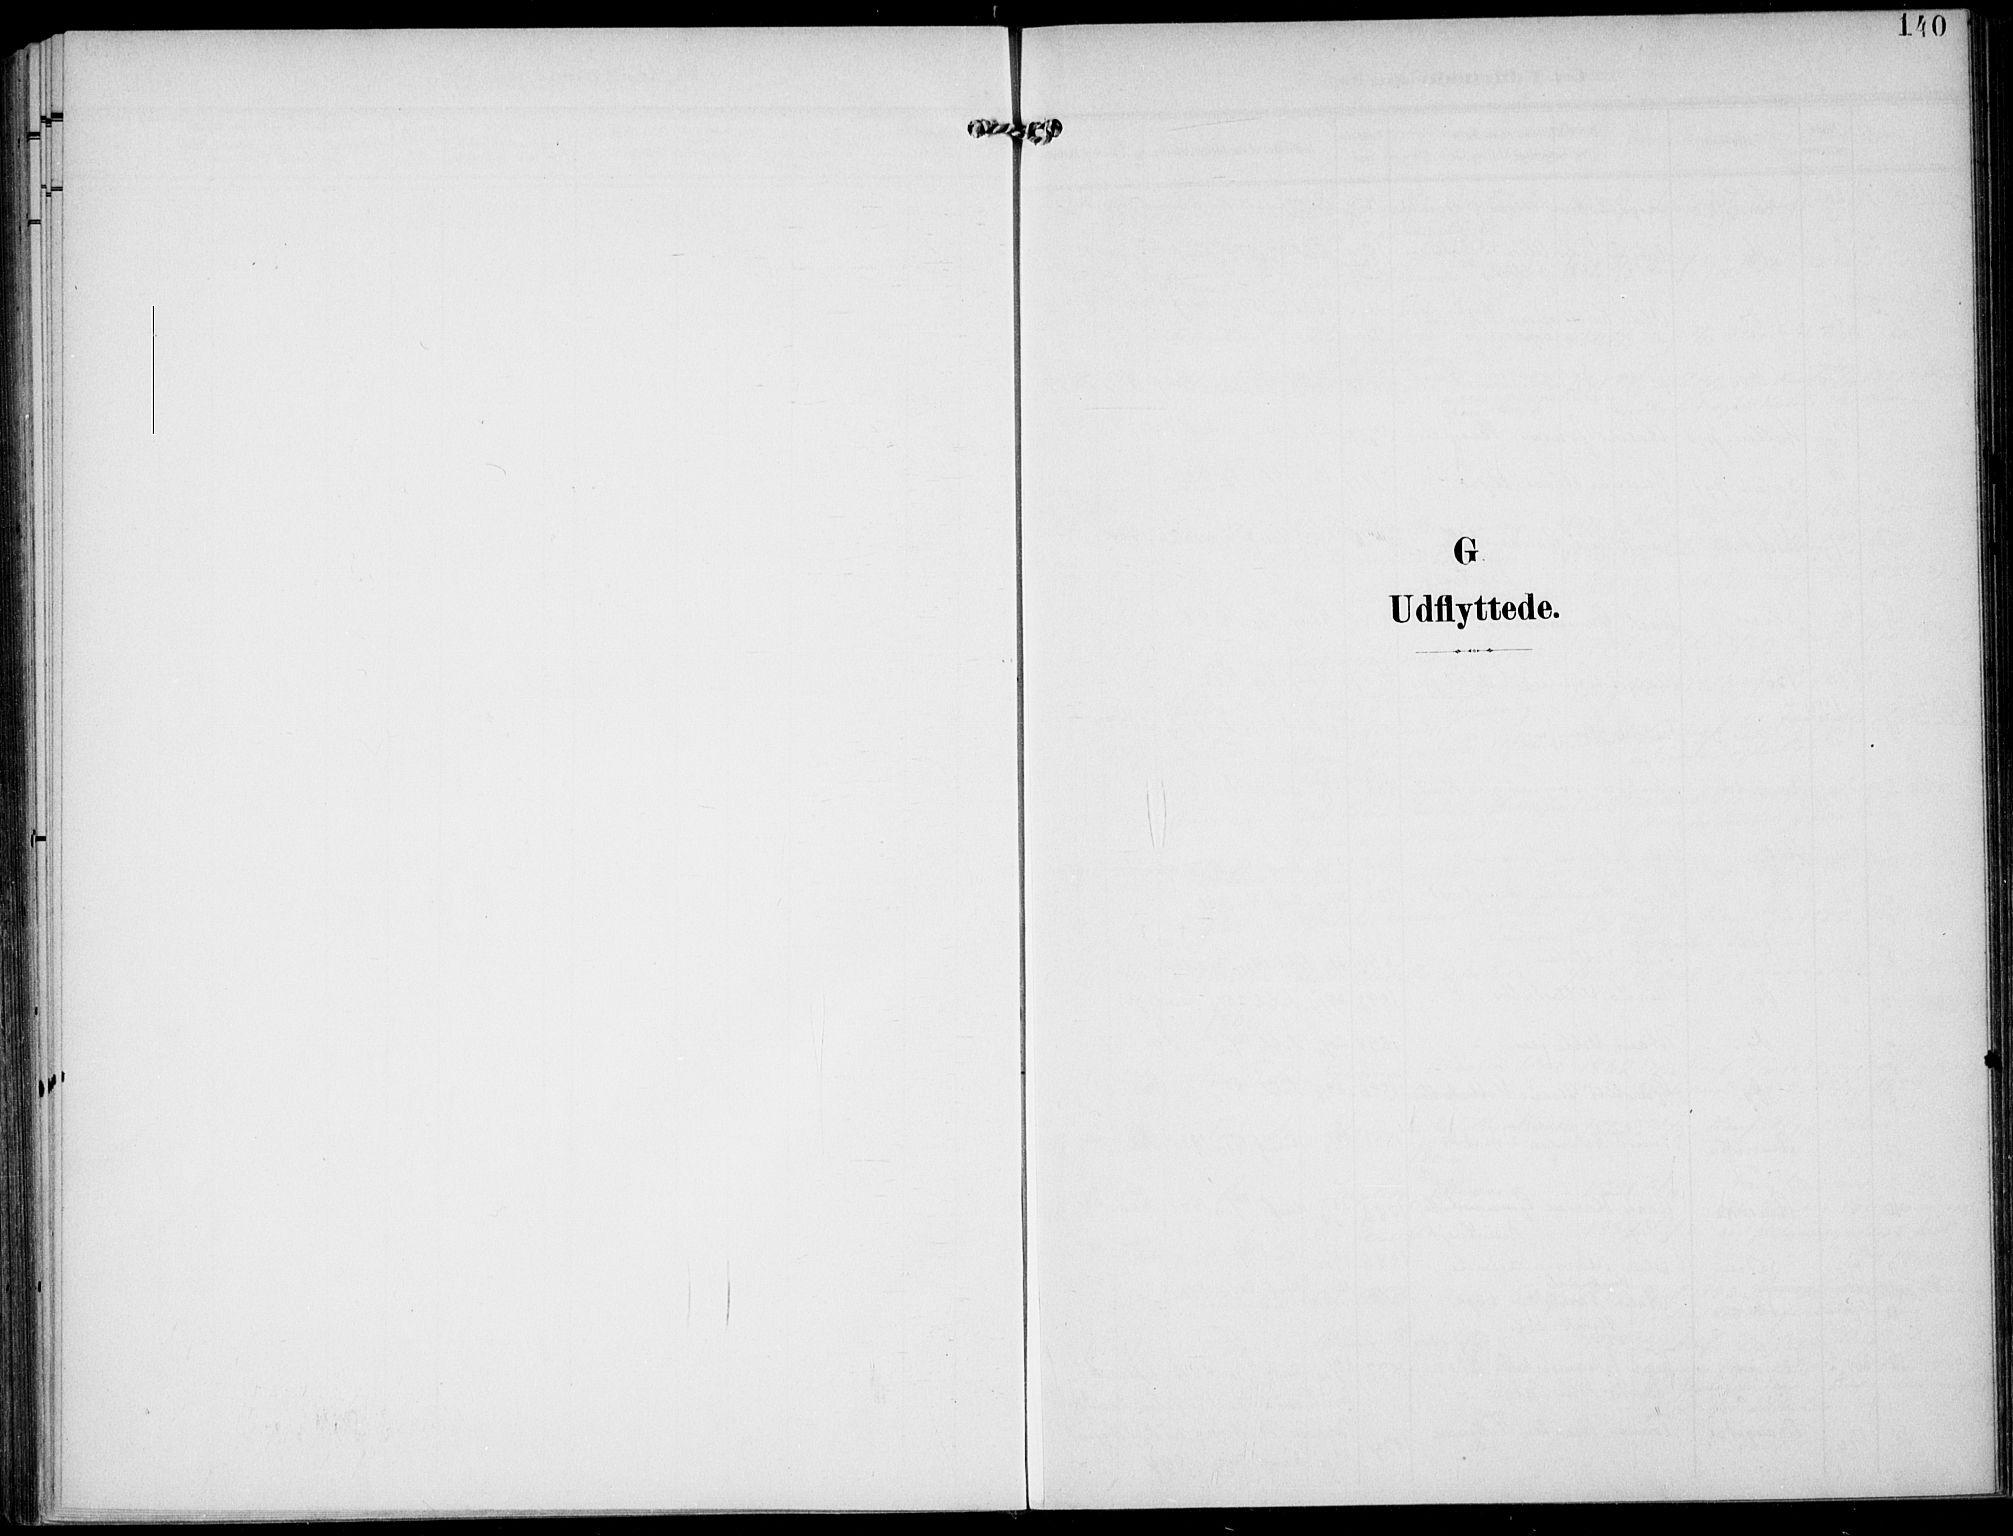 SAKO, Lunde kirkebøker, F/Fa/L0004: Ministerialbok nr. I 4, 1902-1913, s. 140